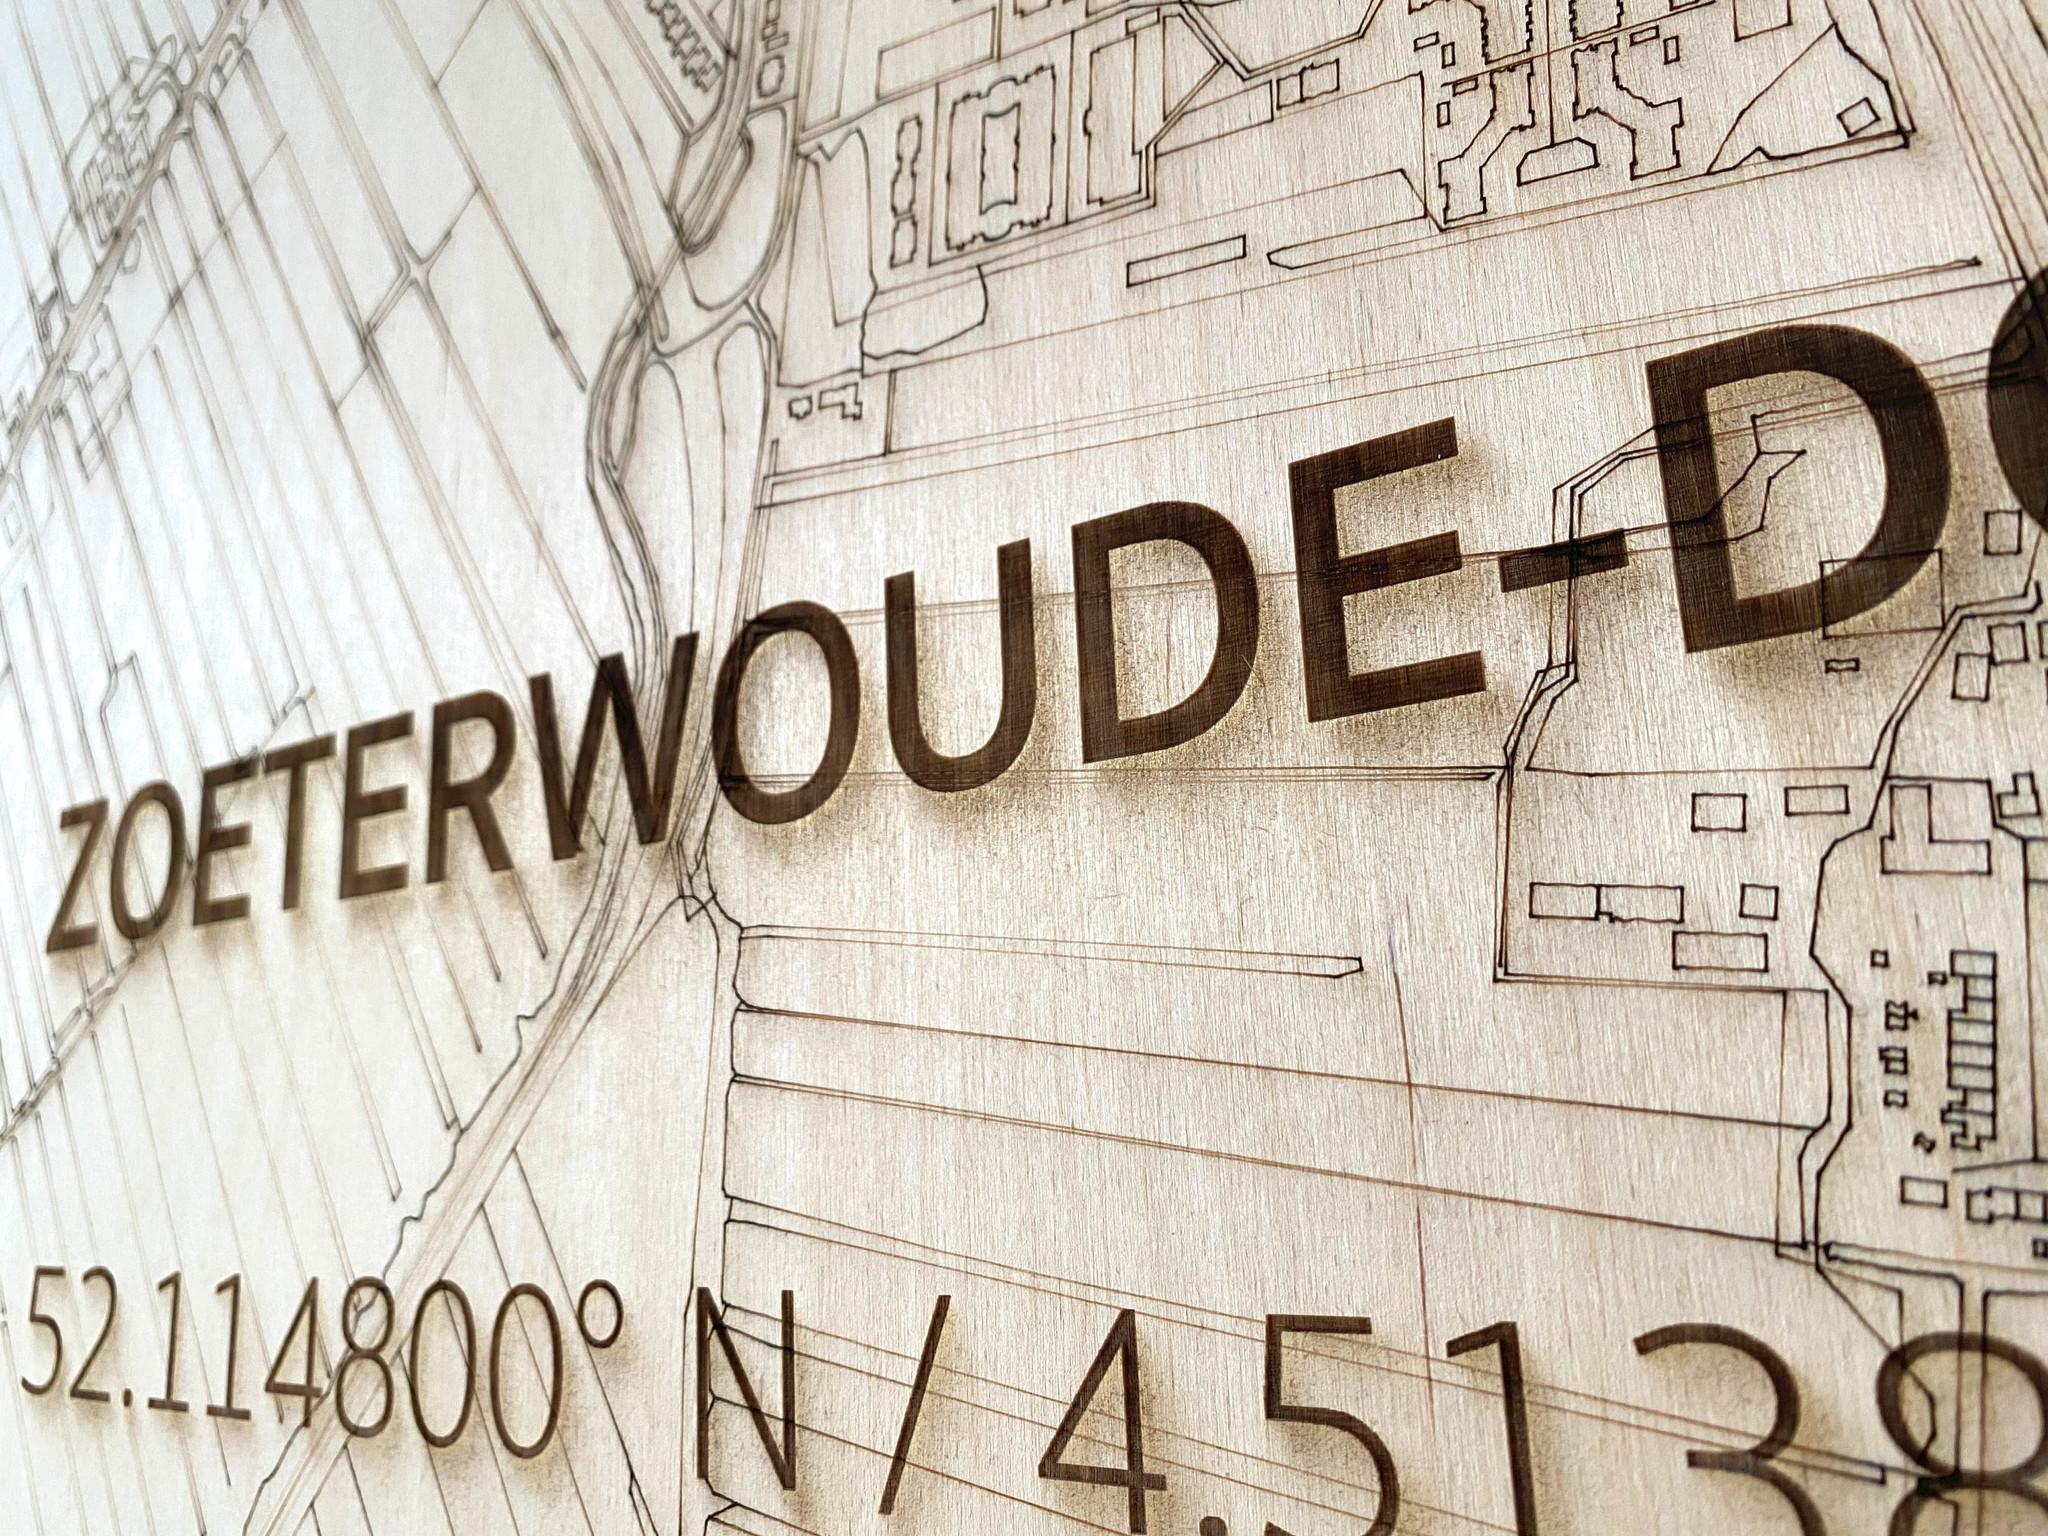 Citymap Zoeterwoude-dorp | houten wanddecoratie-4